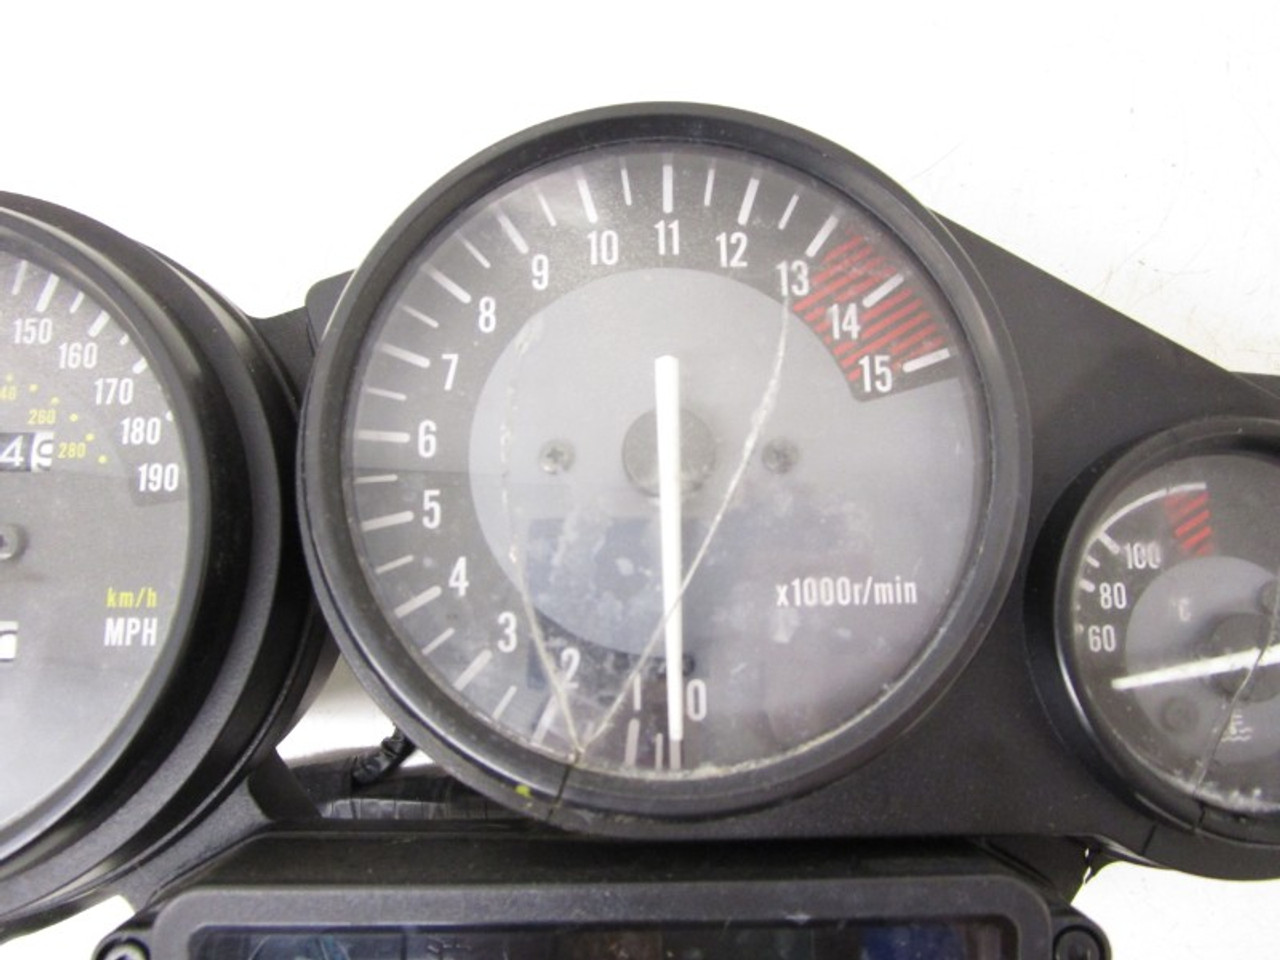 190 MPH SPEEDO SPEEDOMETER CLOCK SET DASH ASSY THUNDERCAT YAMAHA FZR1000